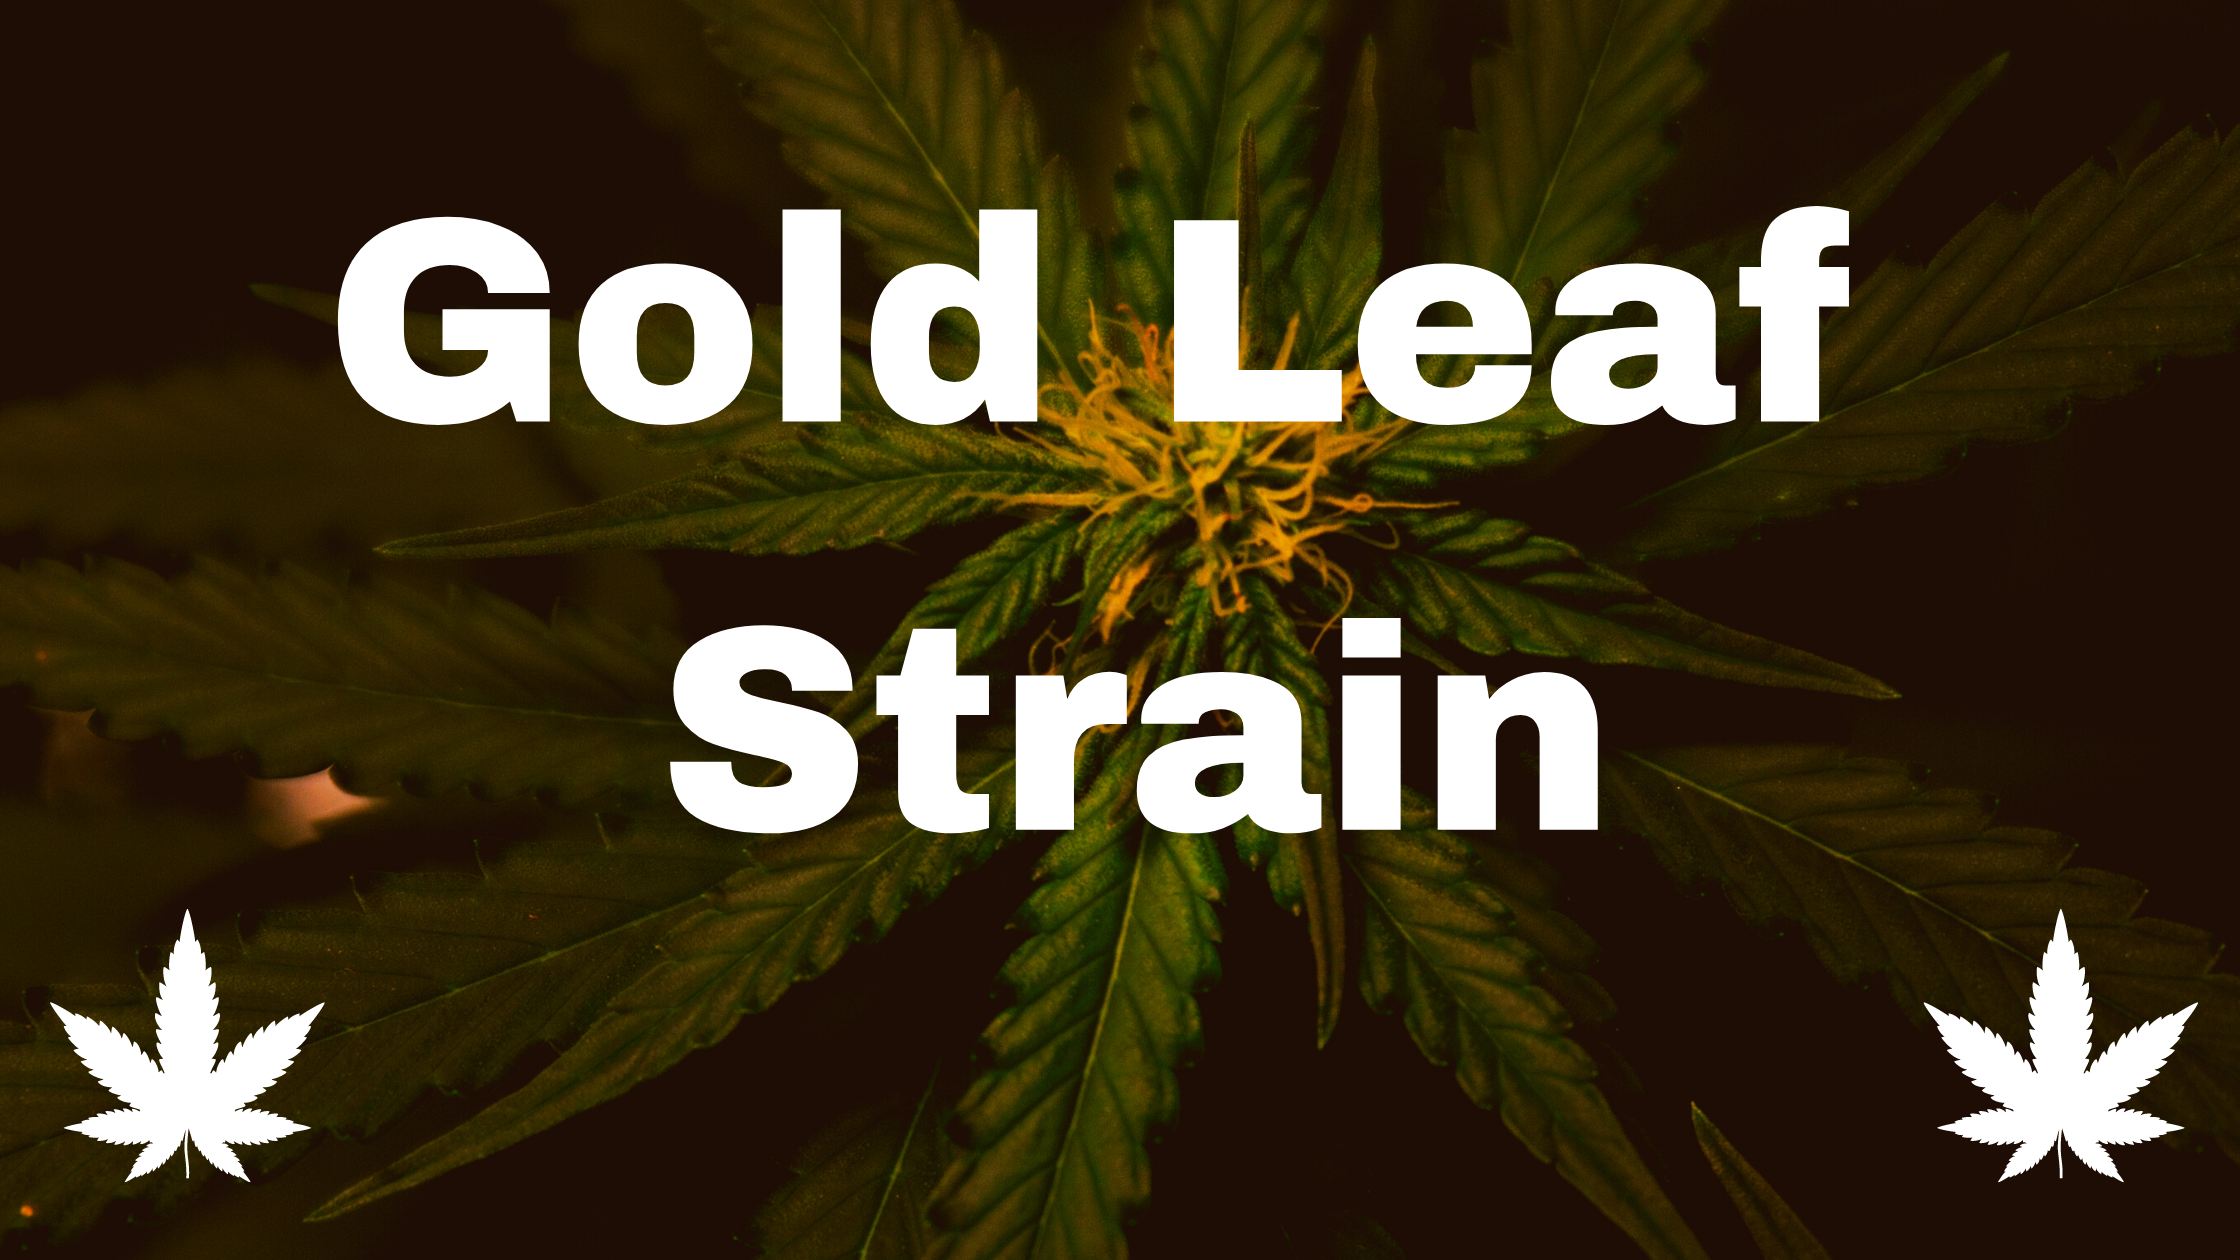 gold leaf strain